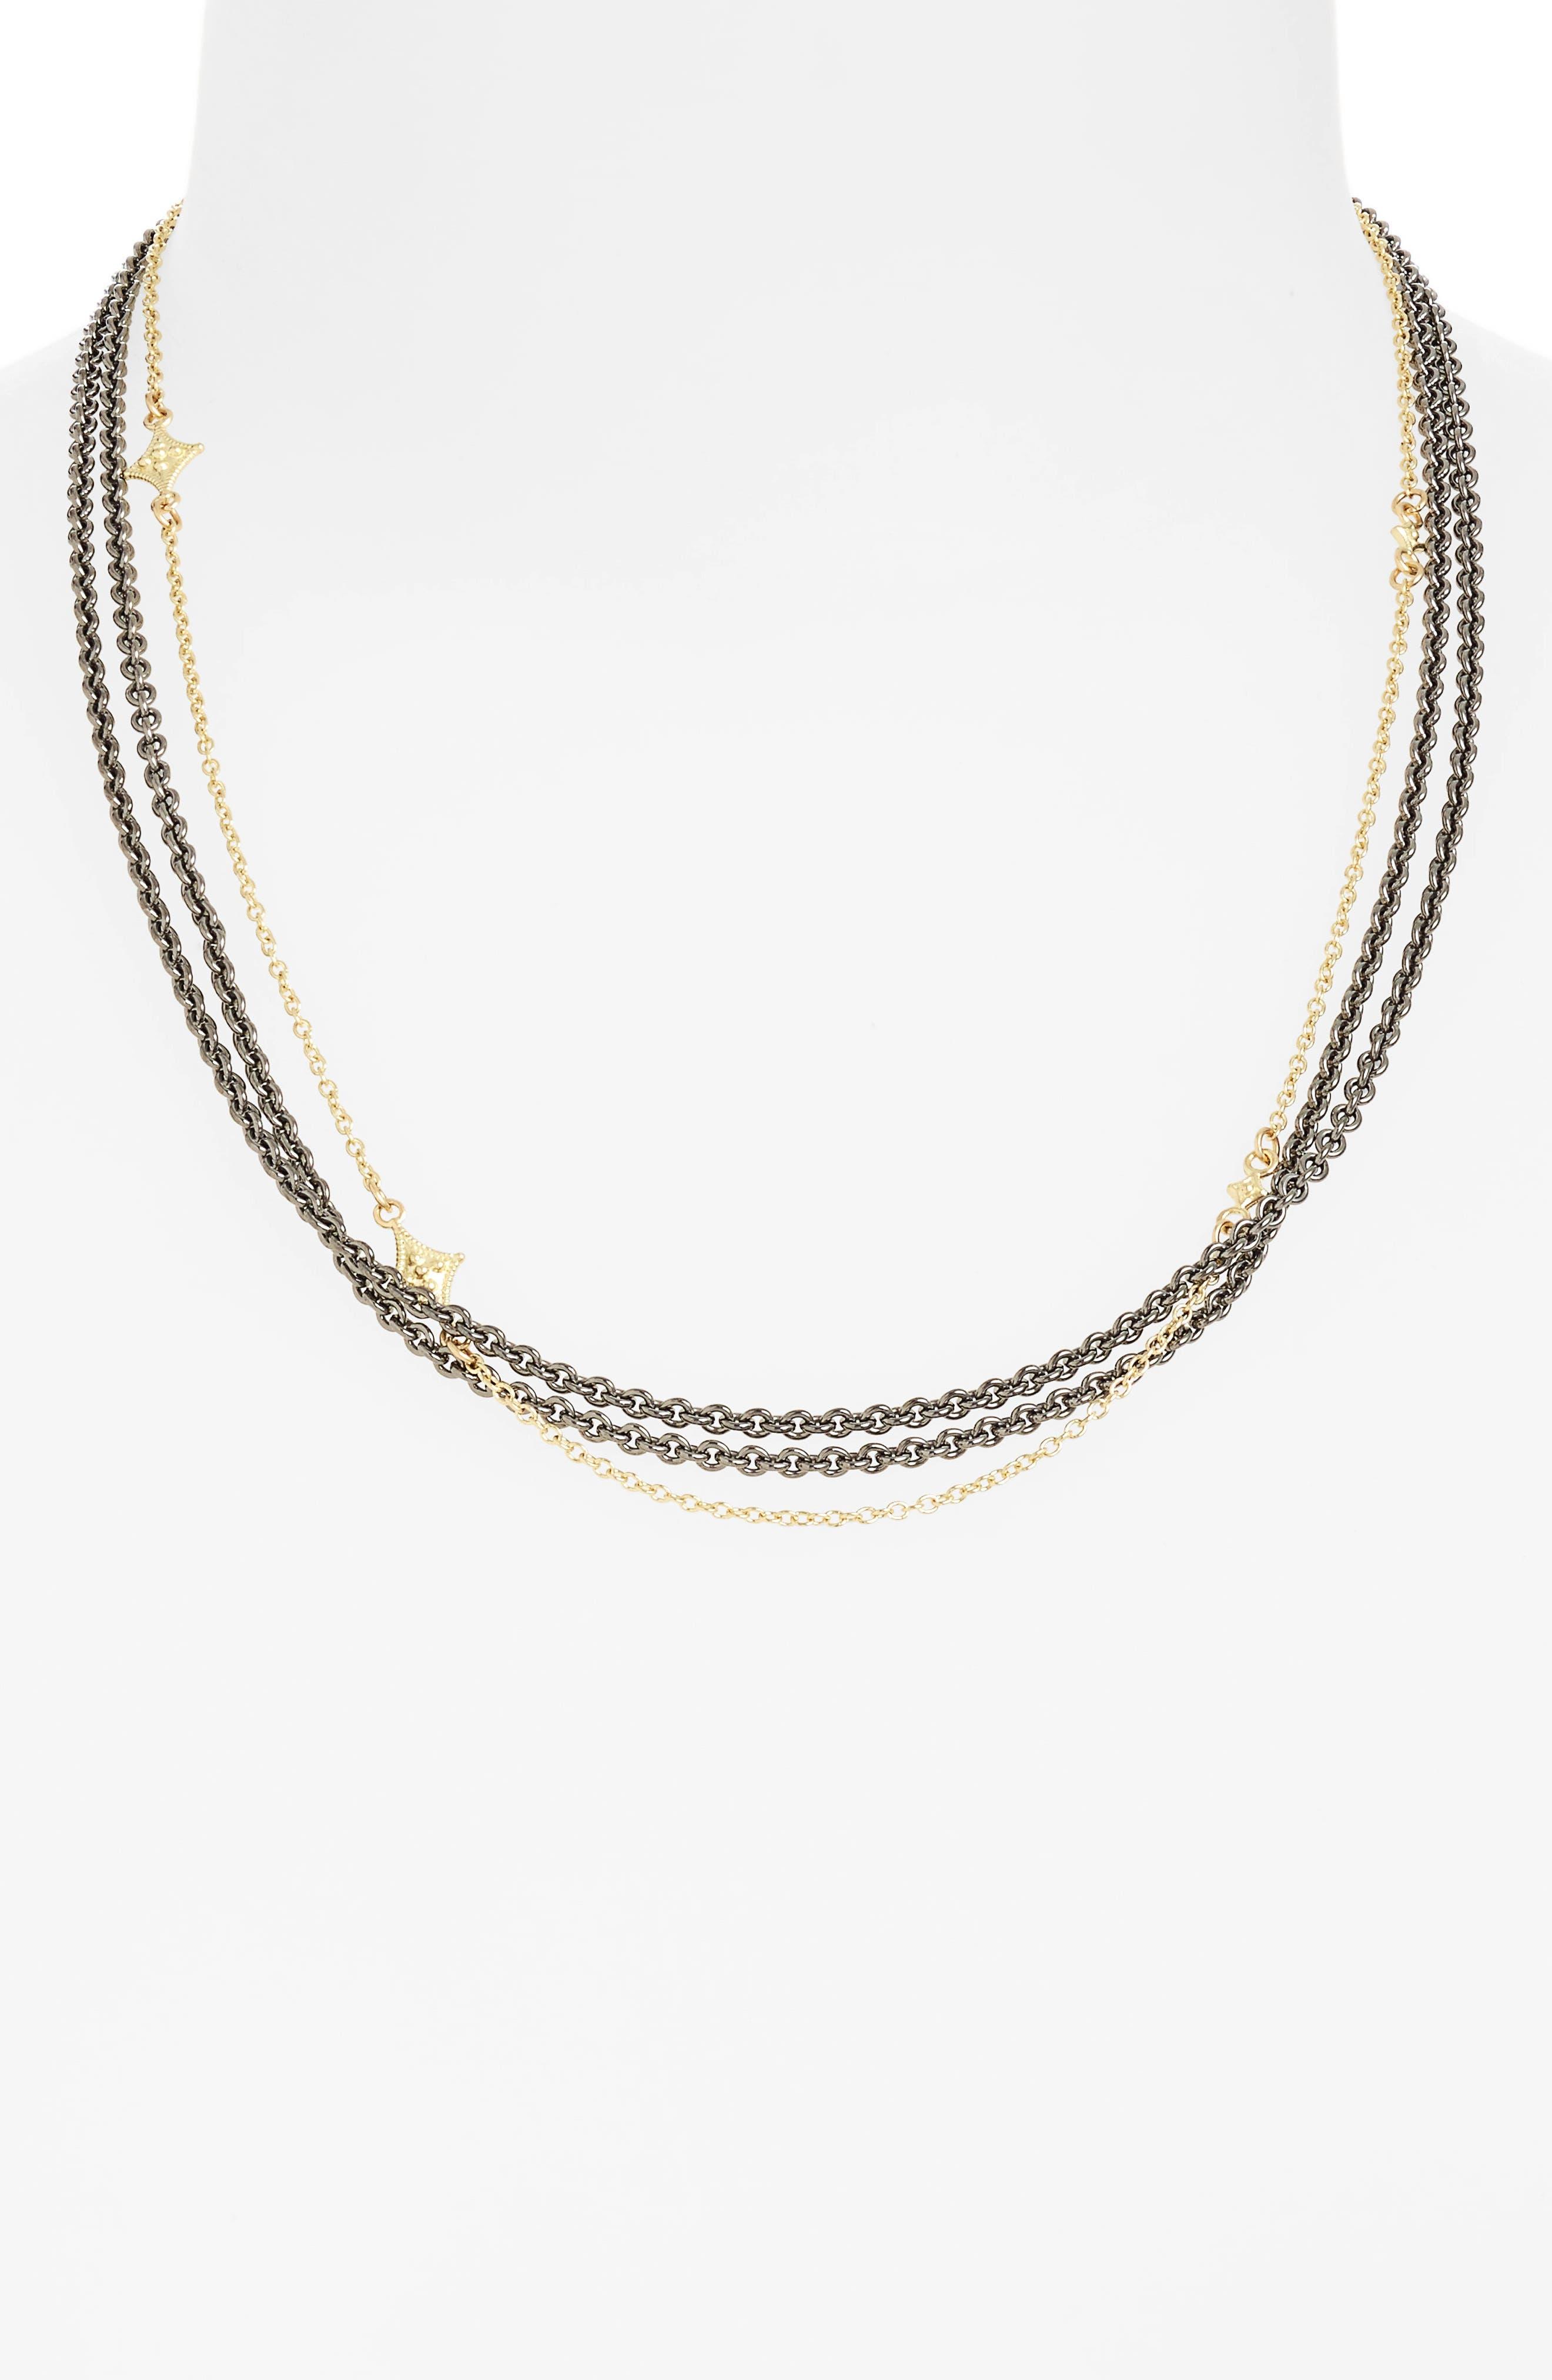 Armenta Old World Crivelli Collar Necklace